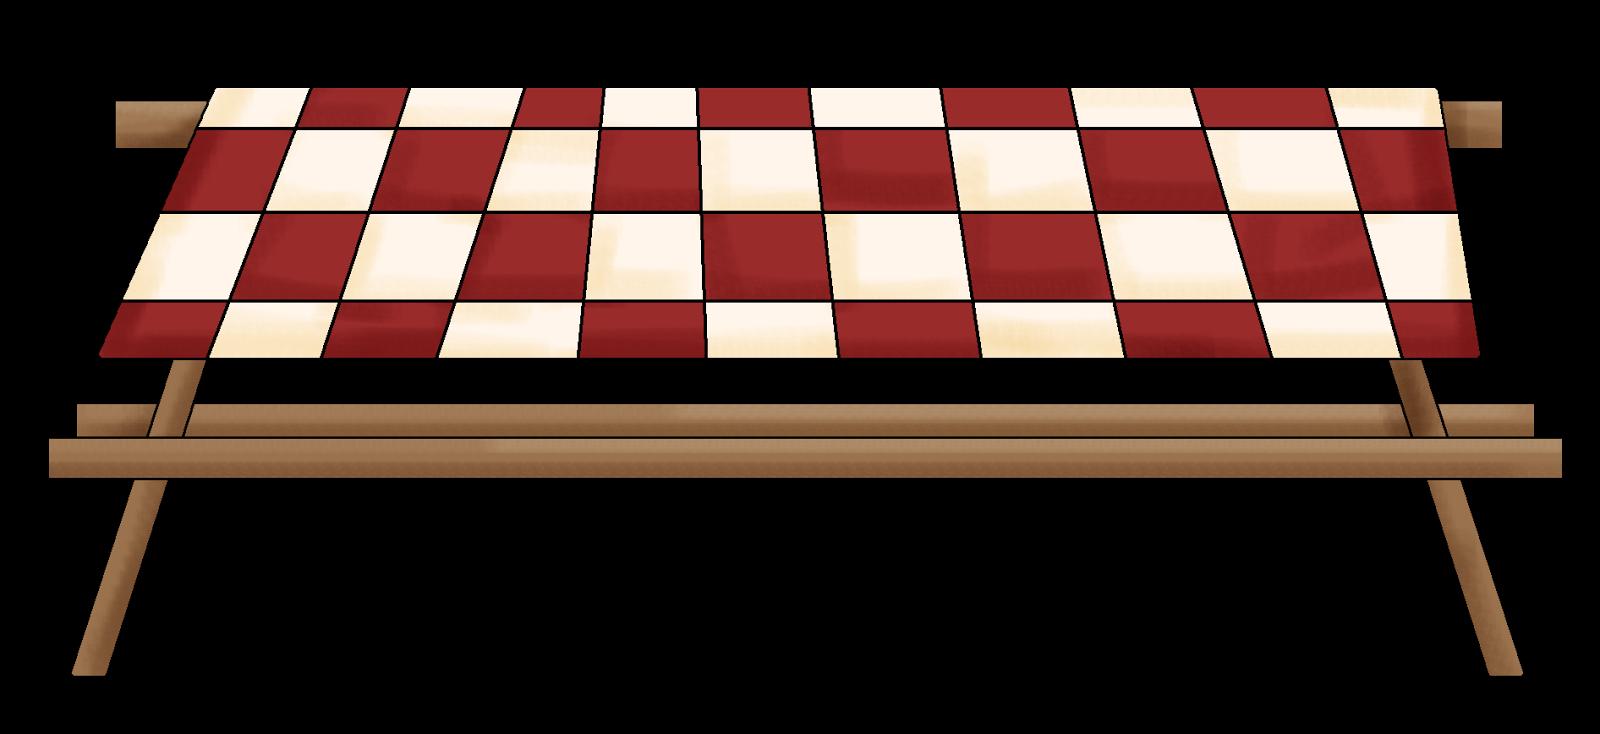 picnic border clipart